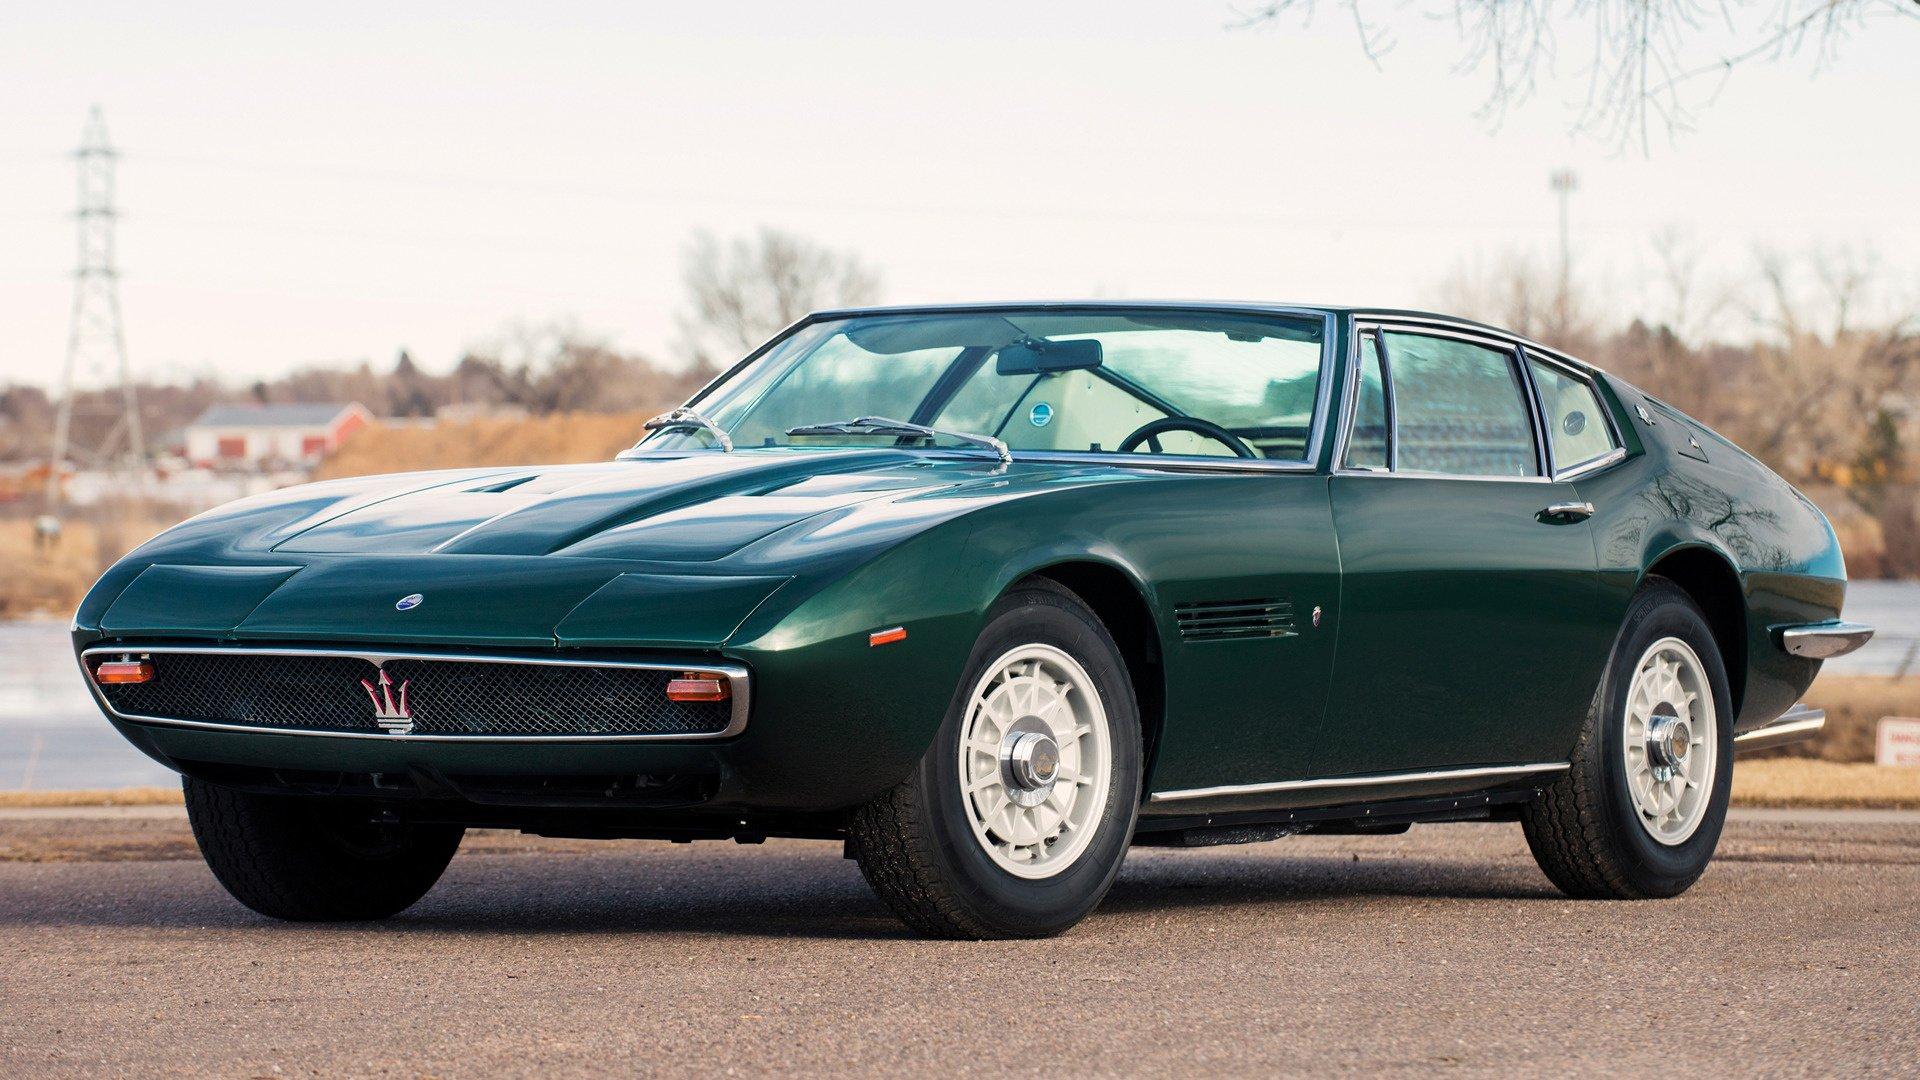 Vehicles - Maserati Ghibli  Sport Car Grand Tourer Green Car Old Car Car Hideaway Headlights Wallpaper